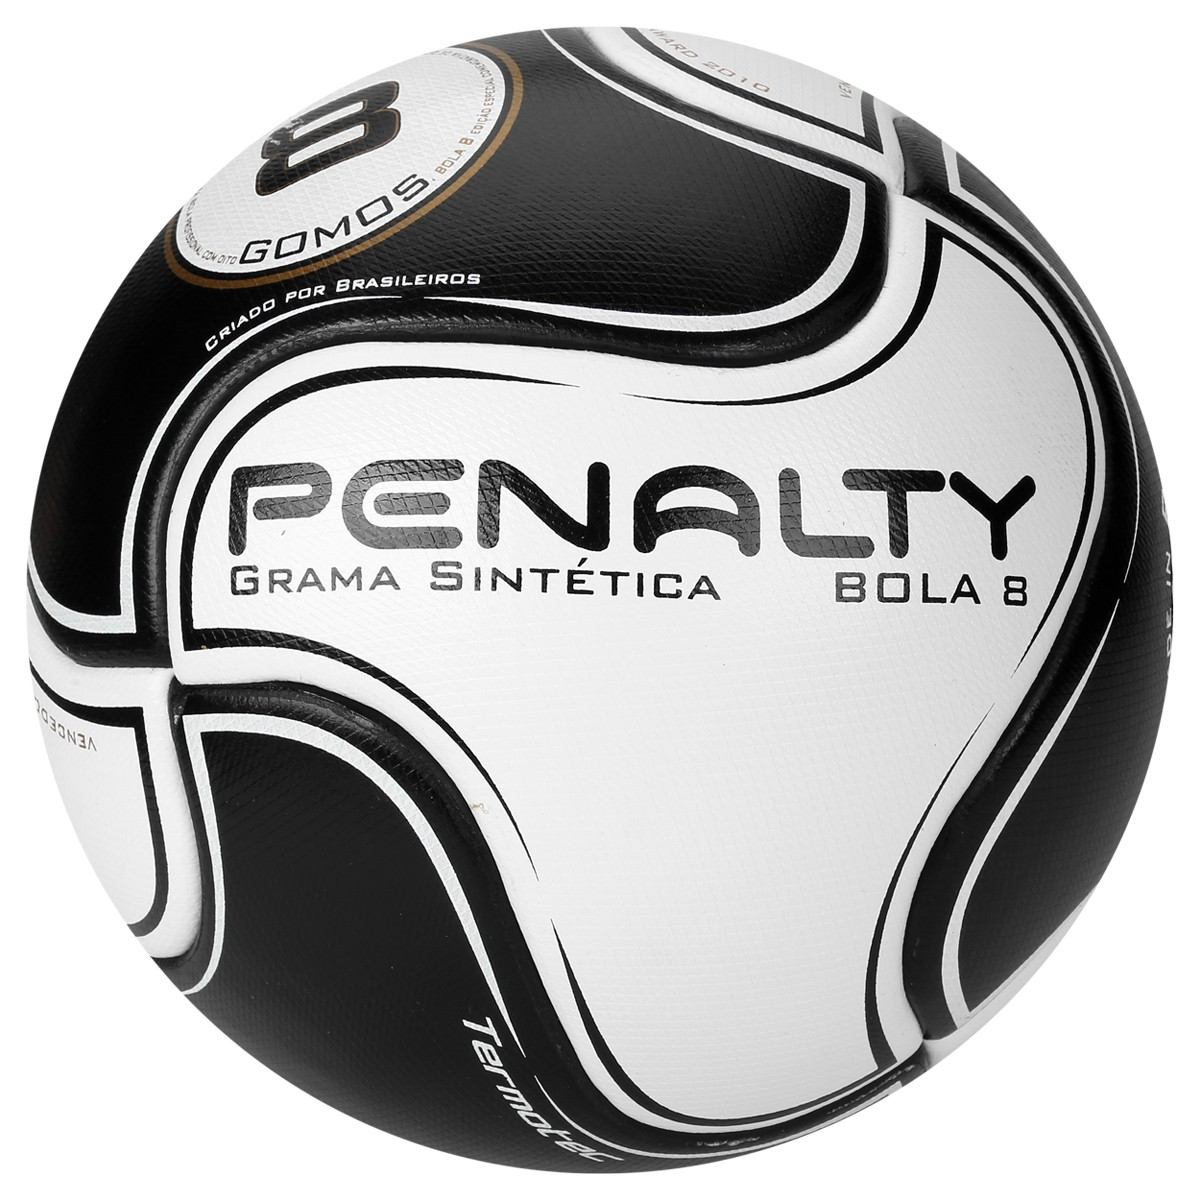 8138c708bf bola penalty society 8 termotec s11 r1 - grama sintética. Carregando zoom.